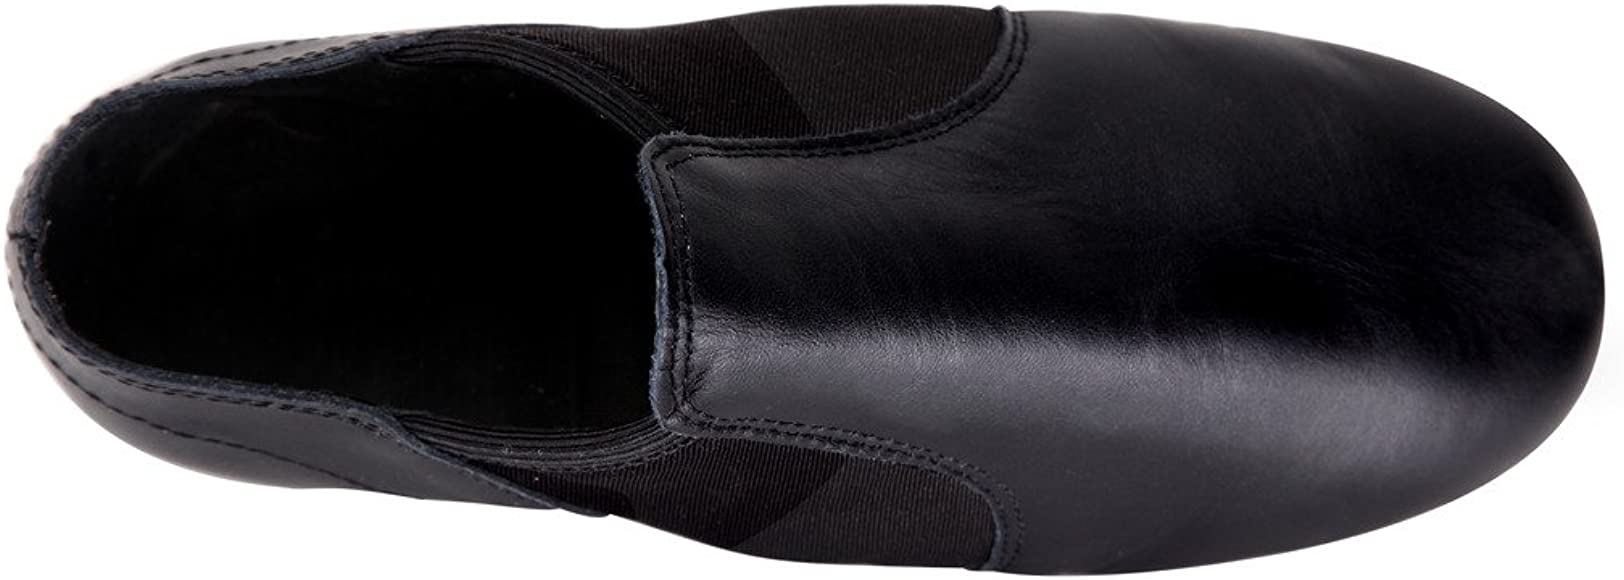 Leather Upper Jazz Shoe Slip-on for Women and Men Tent Linodes